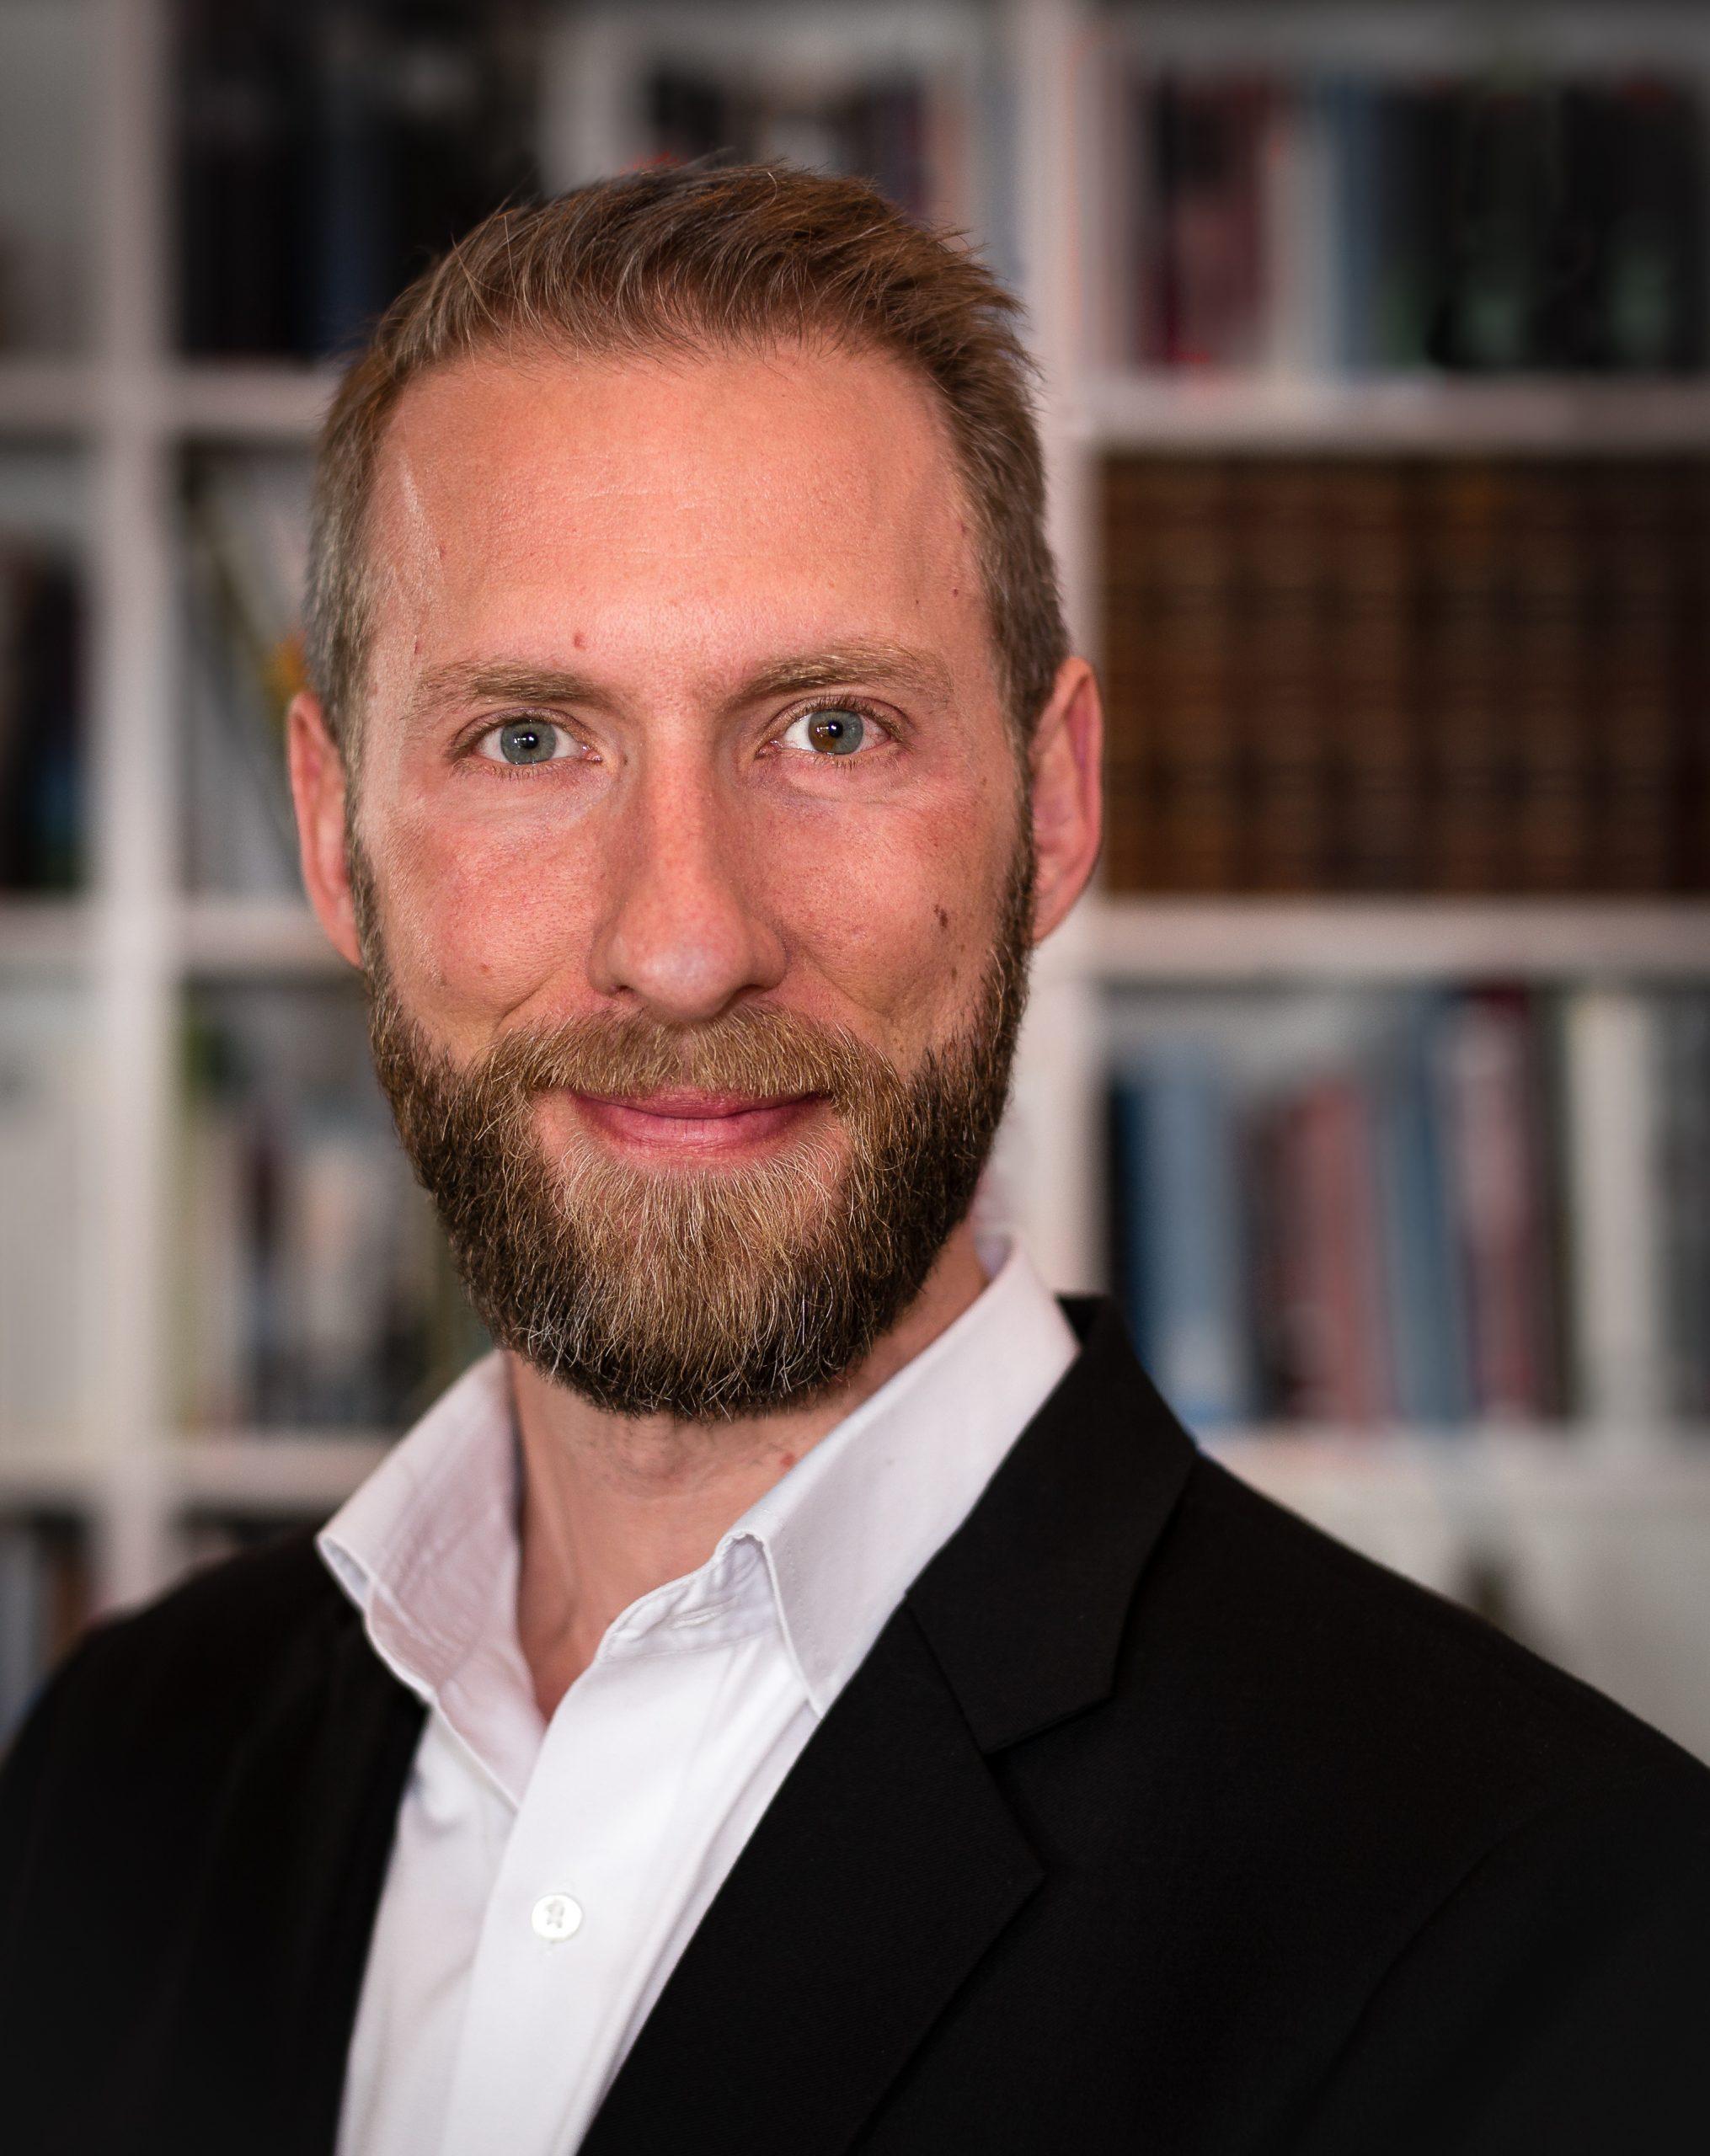 Daniel Cohn, General Manager and 3DP Lead for Protolabs EMEA. Photo via Protolabs.